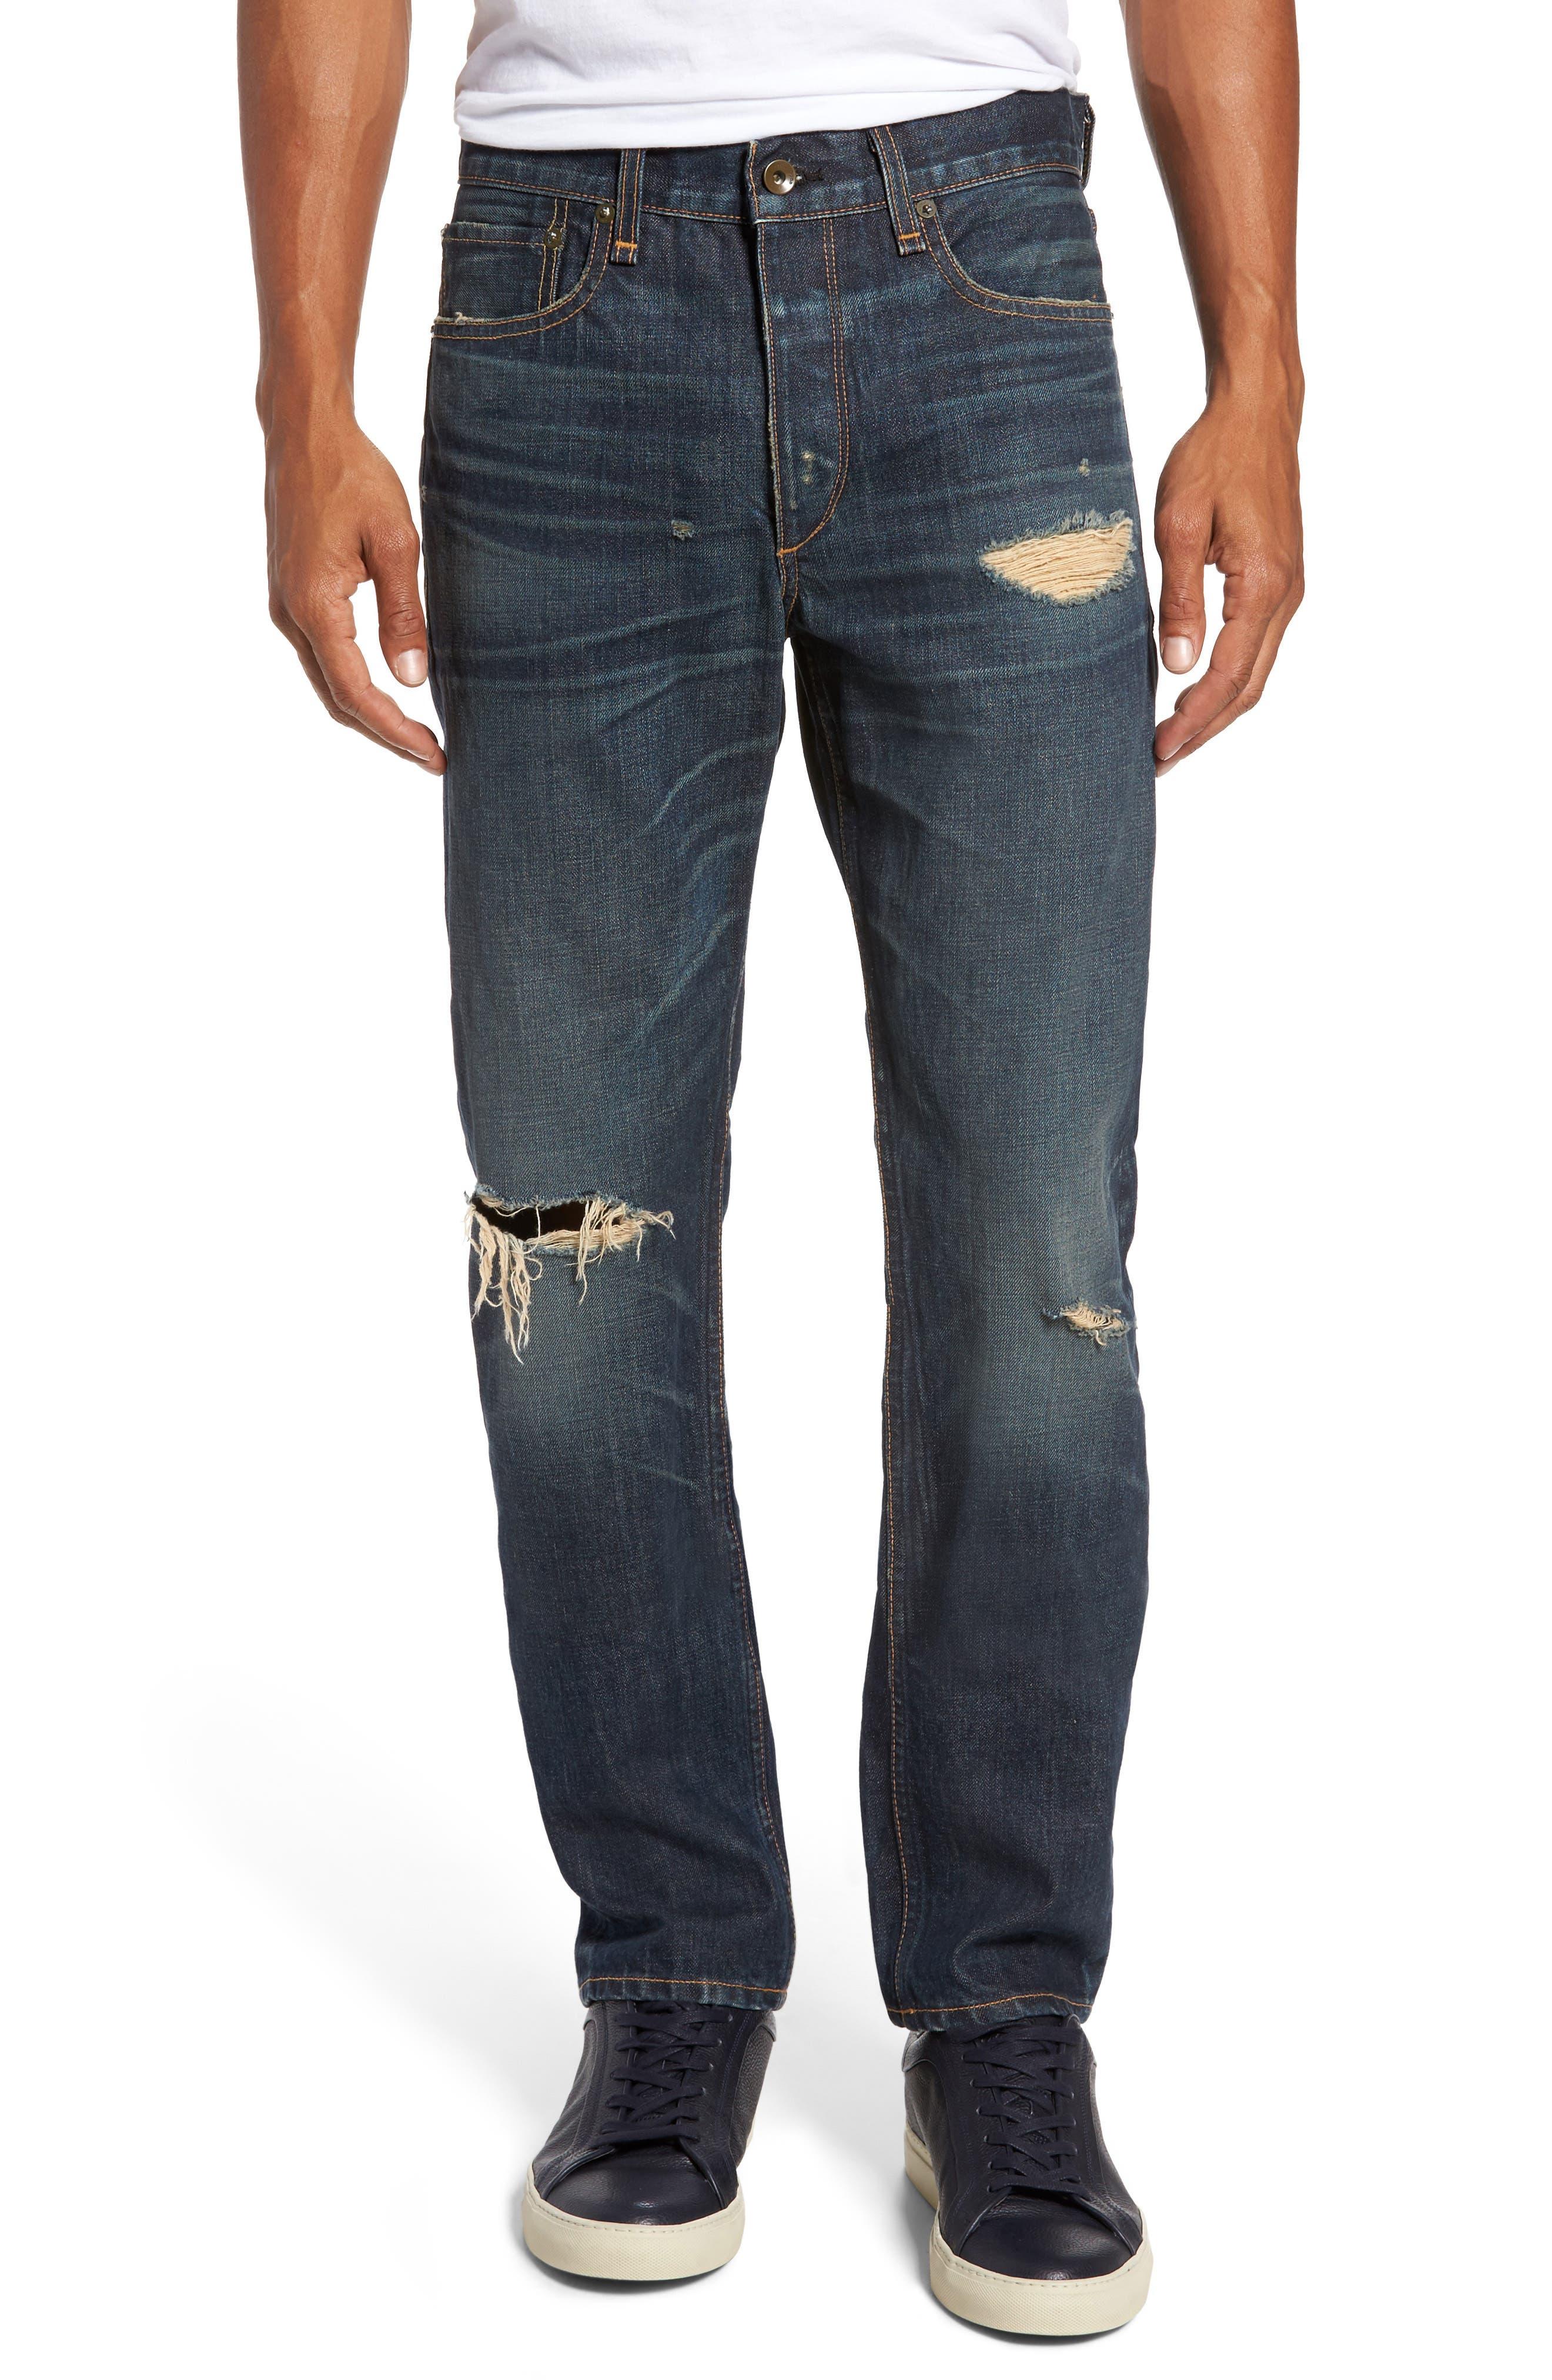 Main Image - rag & bone Fit 2 Slim Fit Jeans (Zeitgeist)